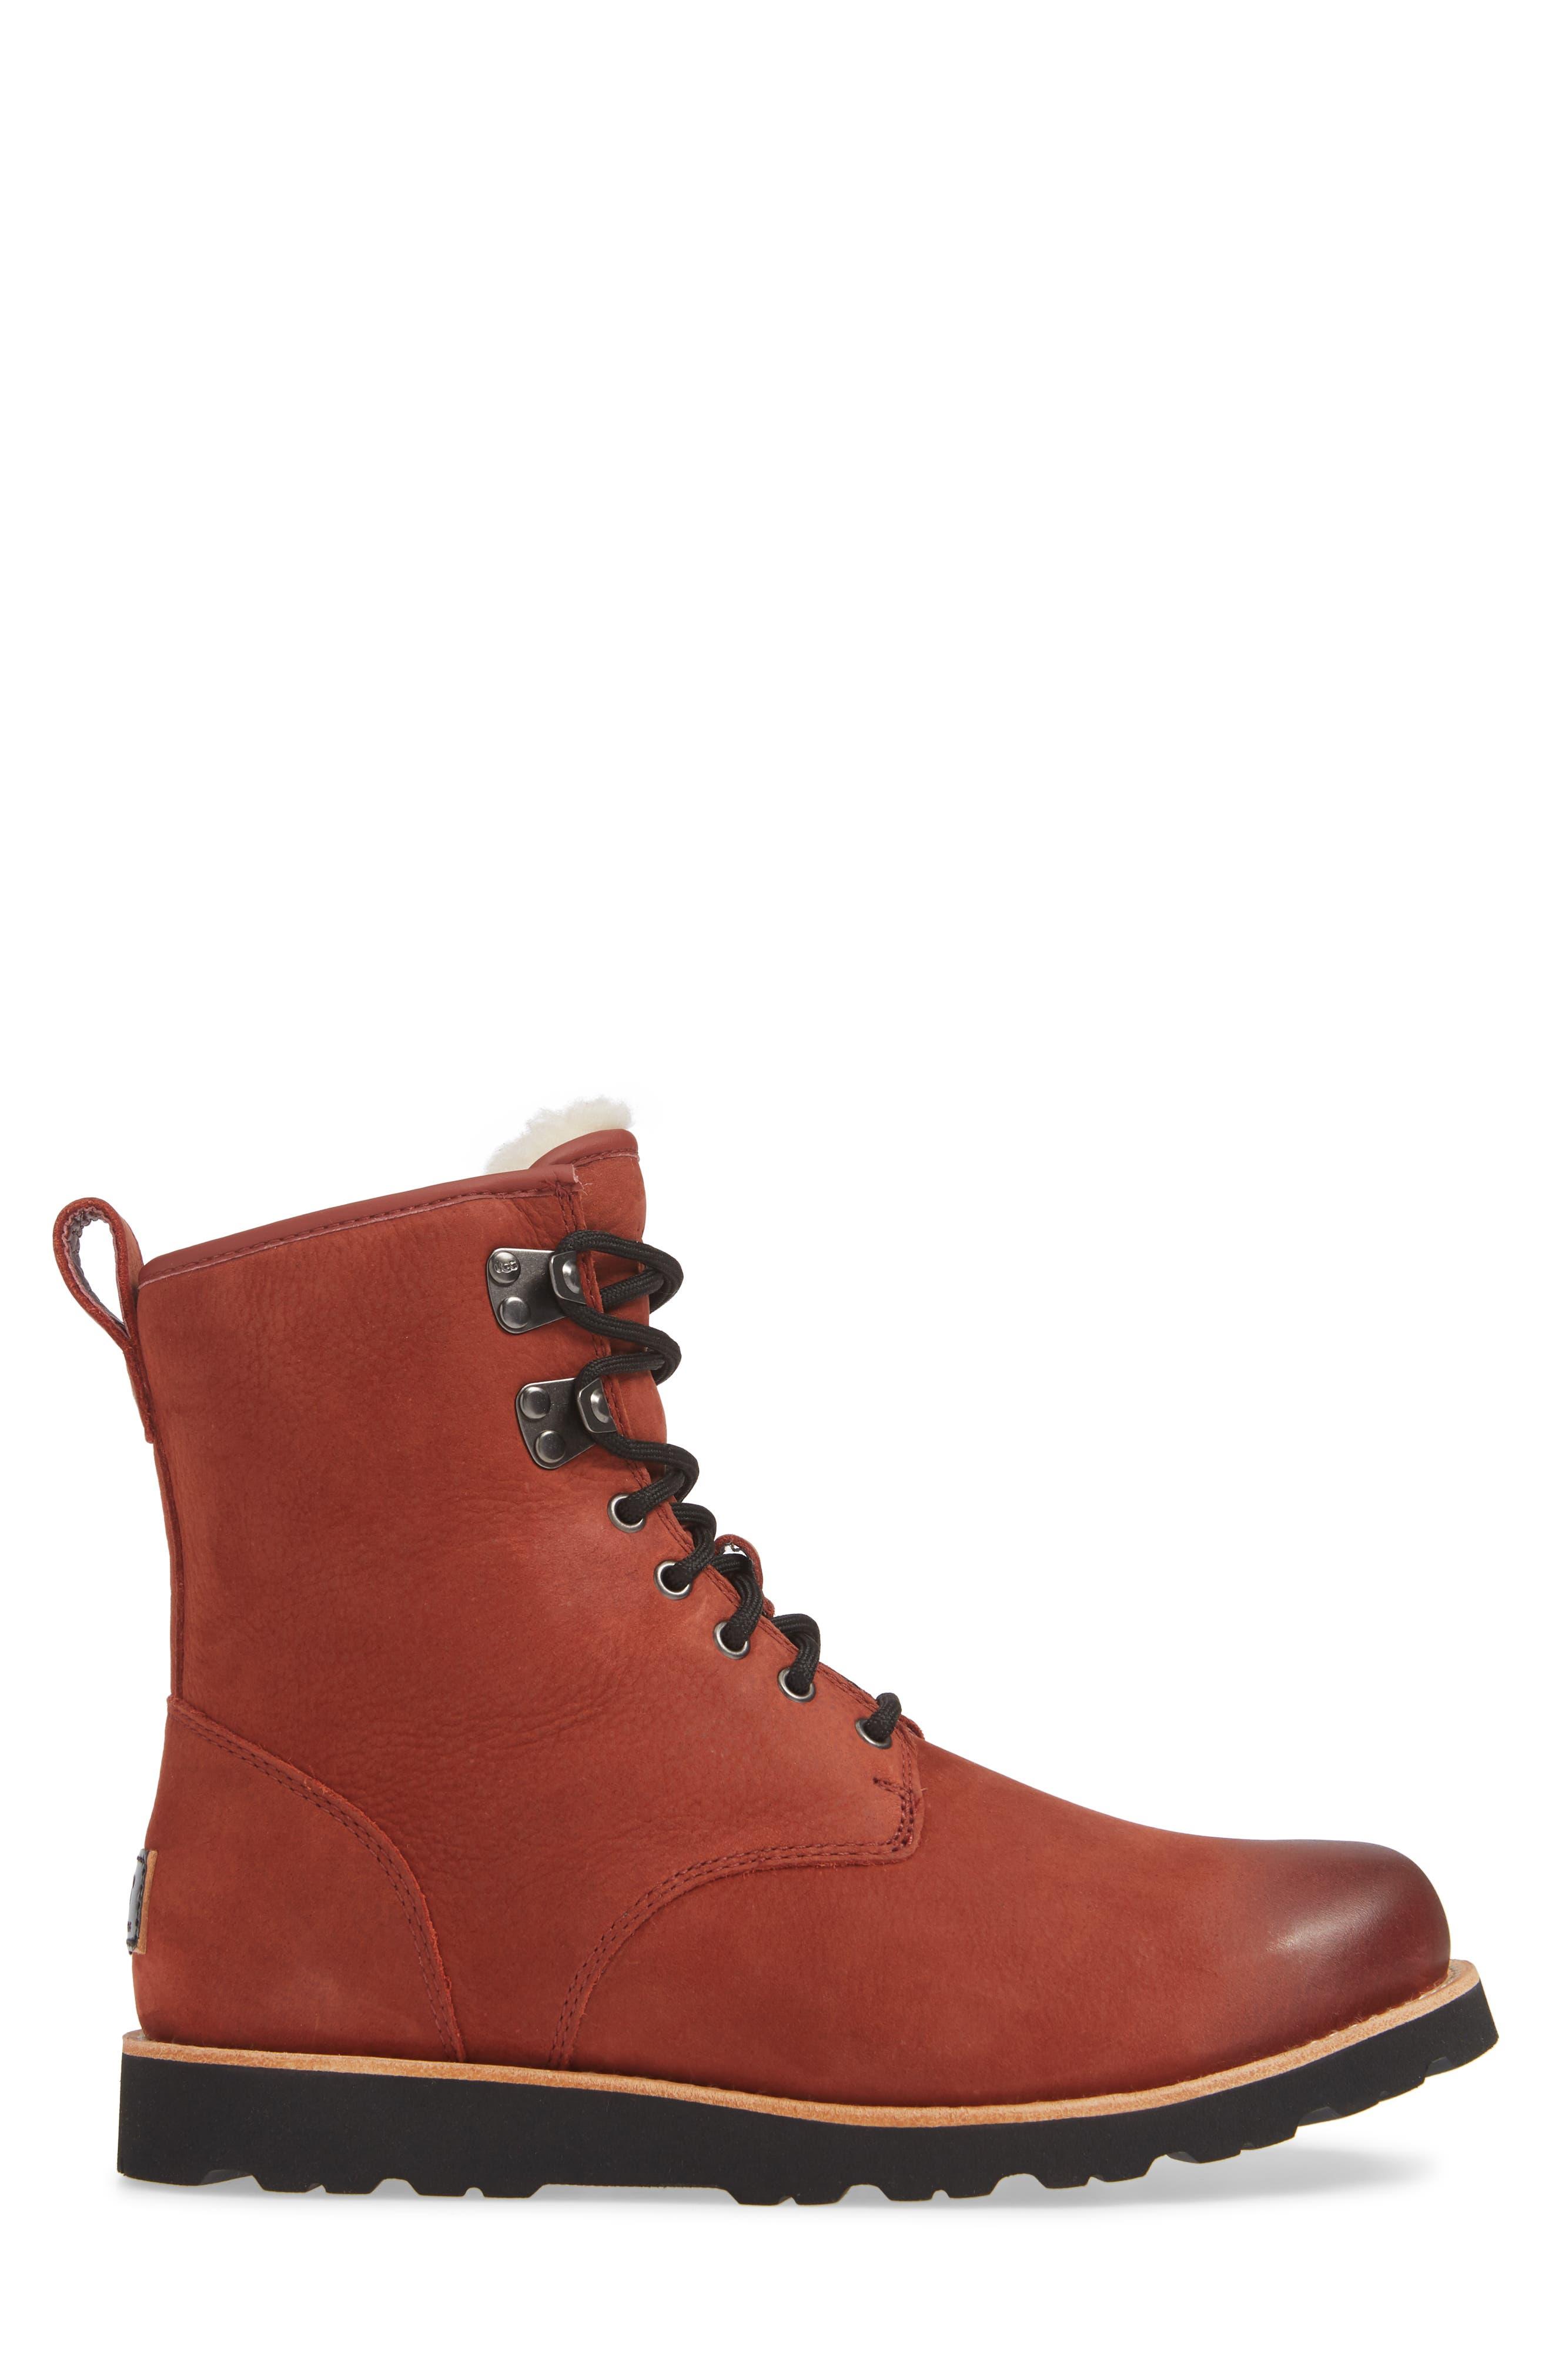 Hannen Waterproof Boot,                             Alternate thumbnail 3, color,                             RED OXIDE